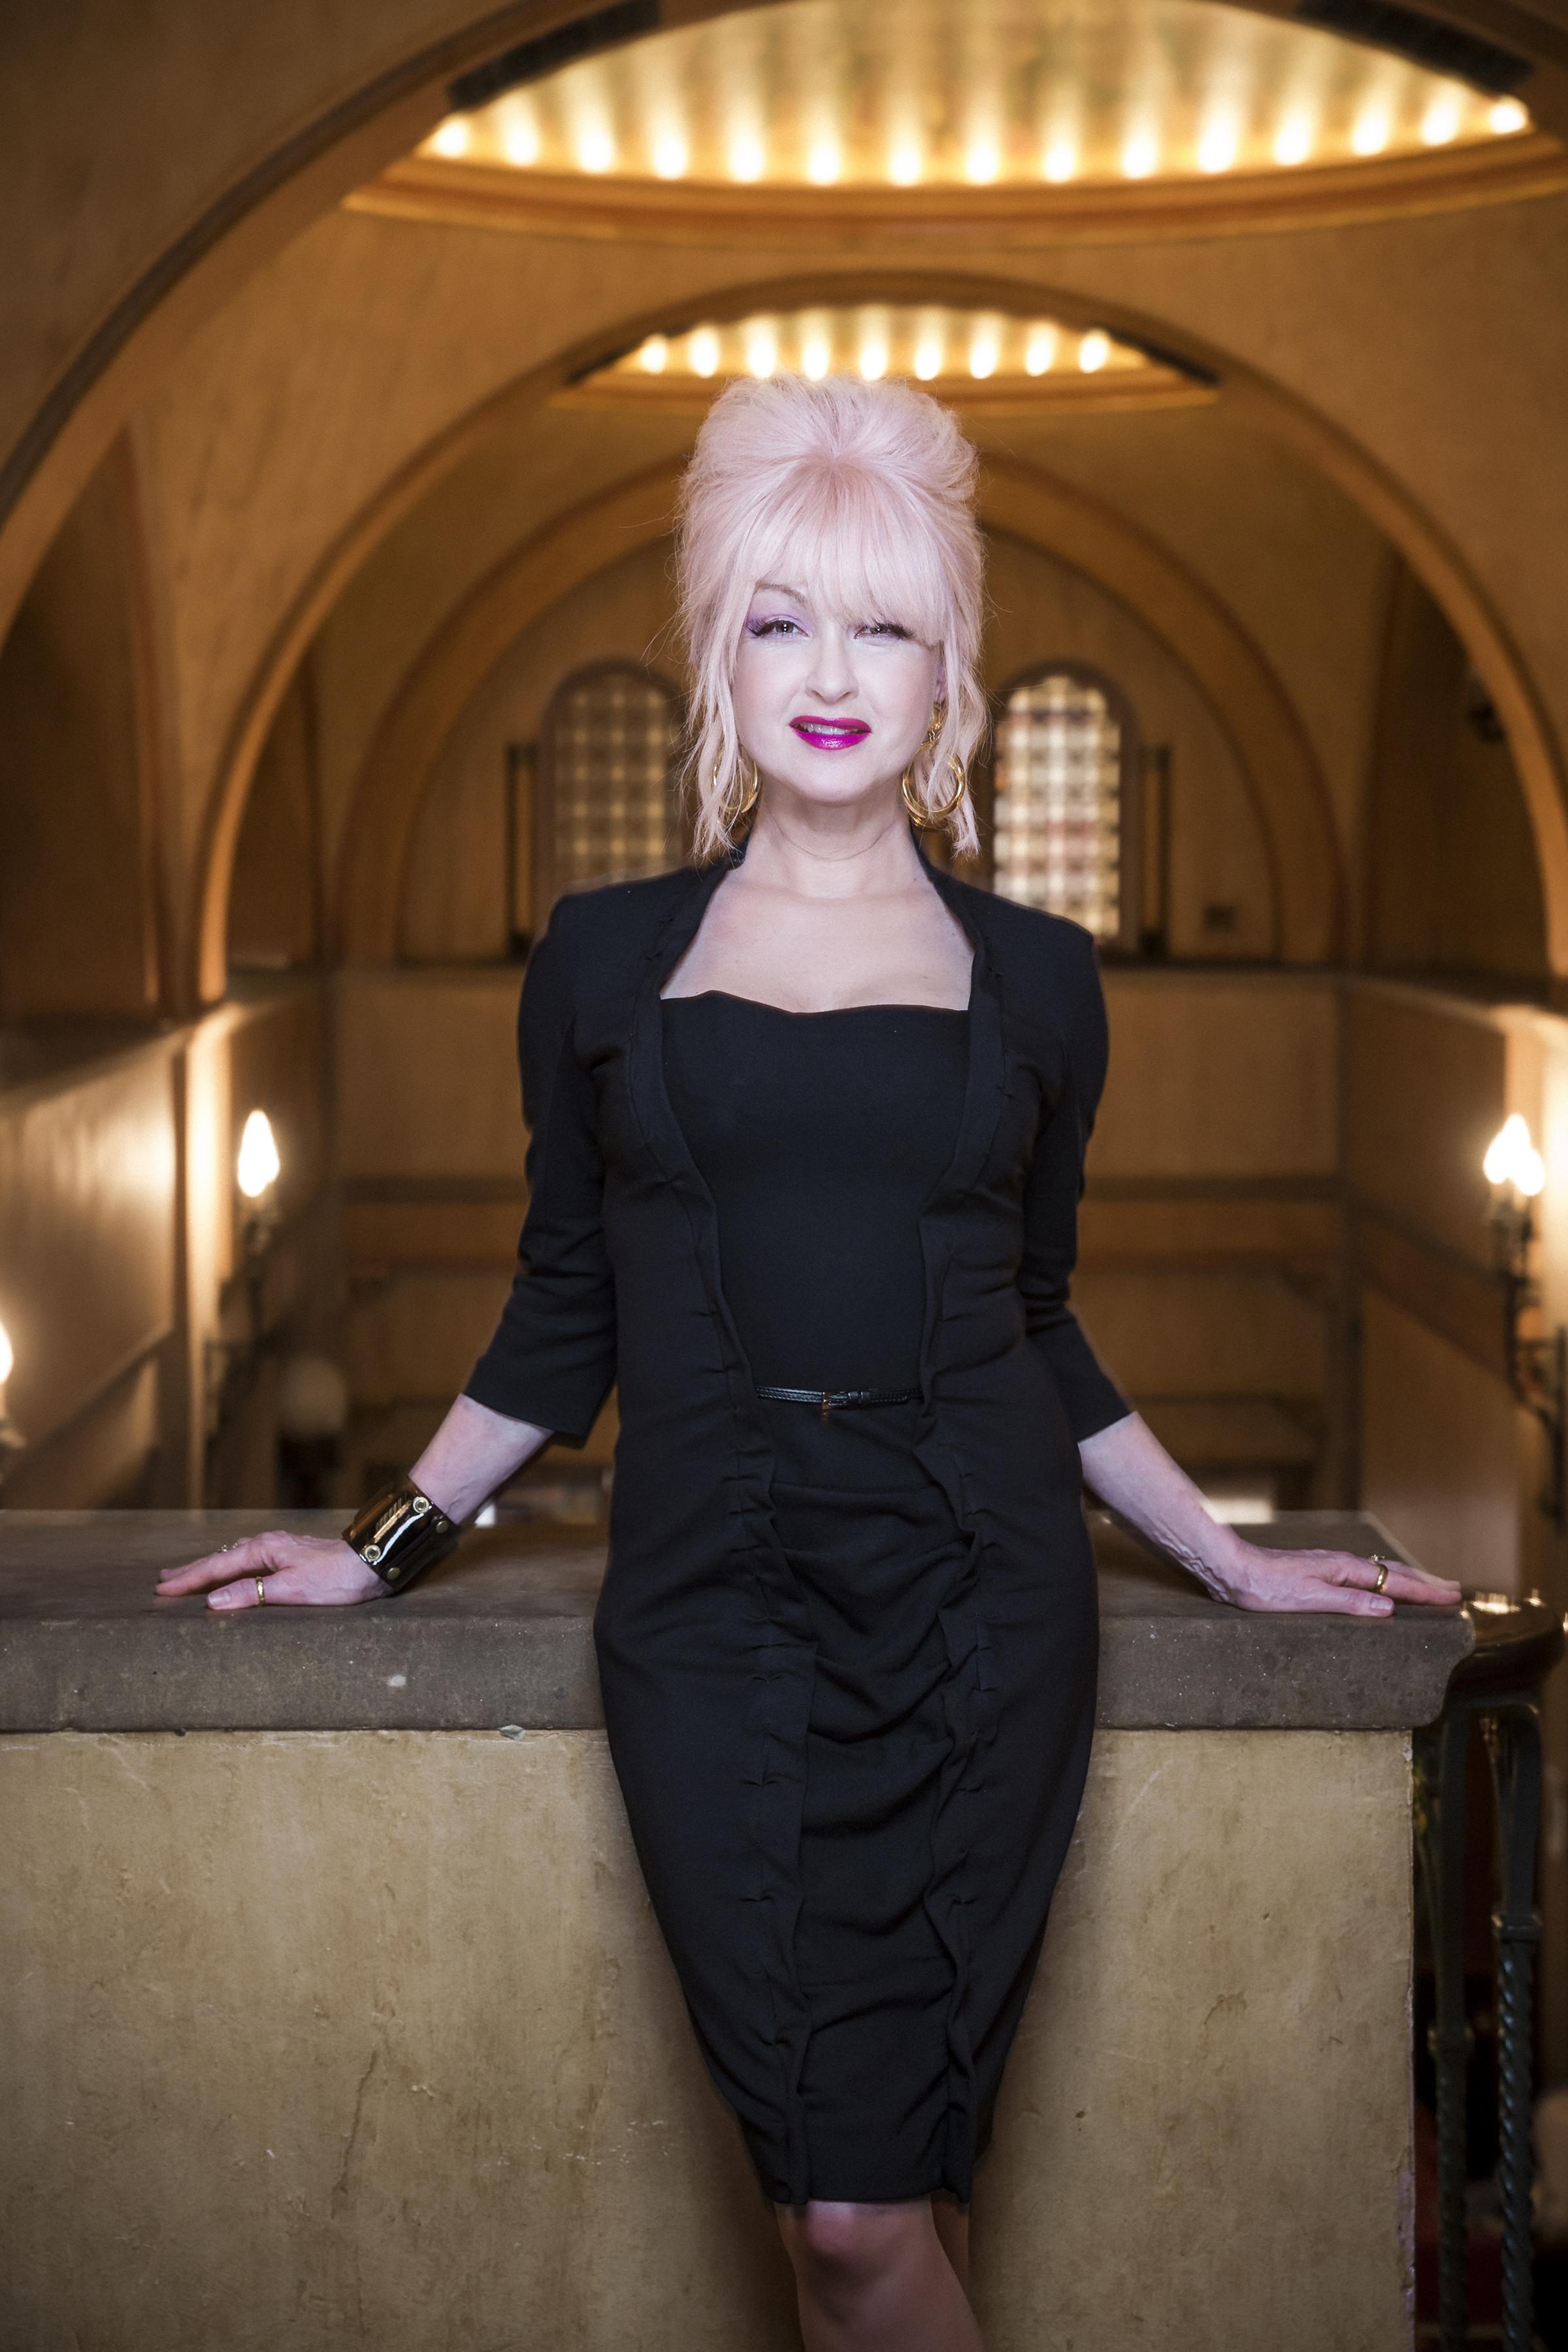 Cyndi Lauper Hard Candy Christmas  Hear Cyndi Lauper Cover Dolly Parton's 'Hard Candy